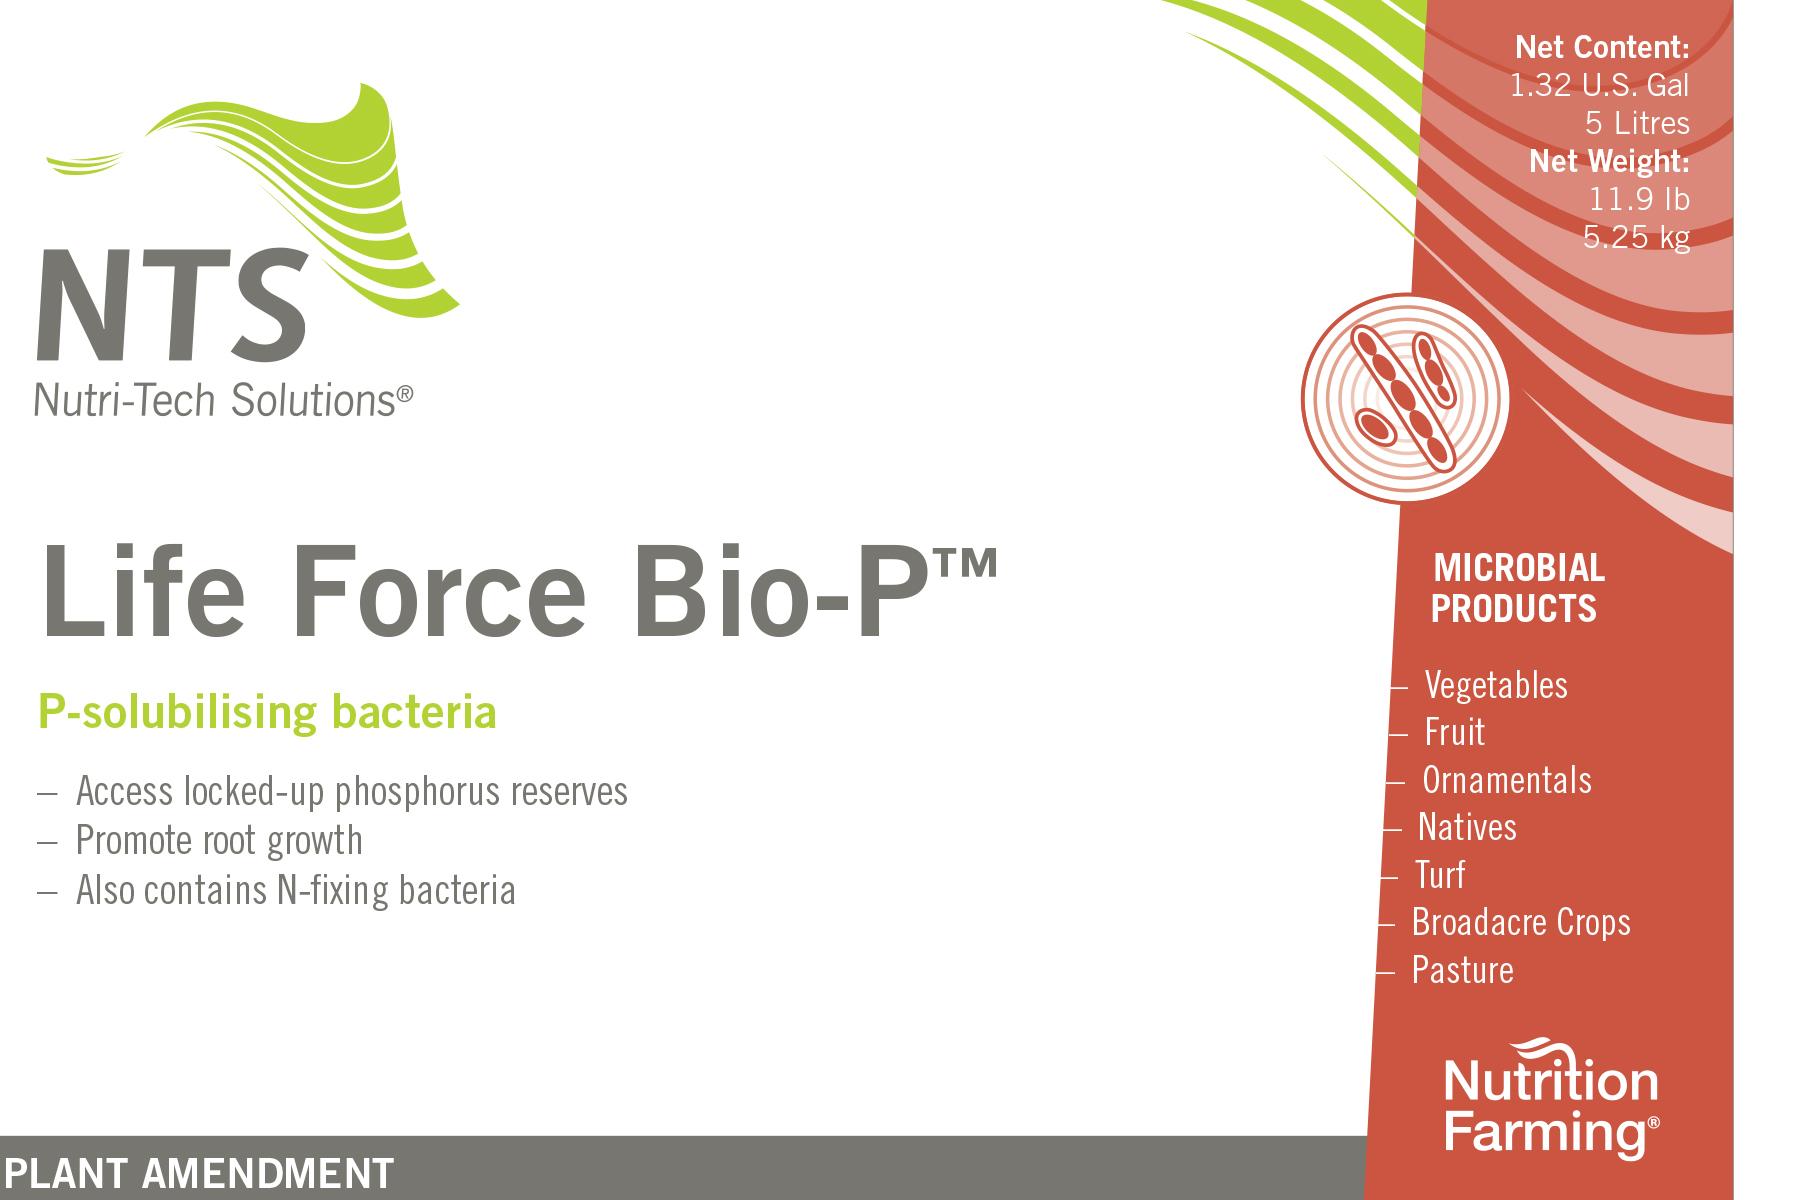 Life Force Bio-P™